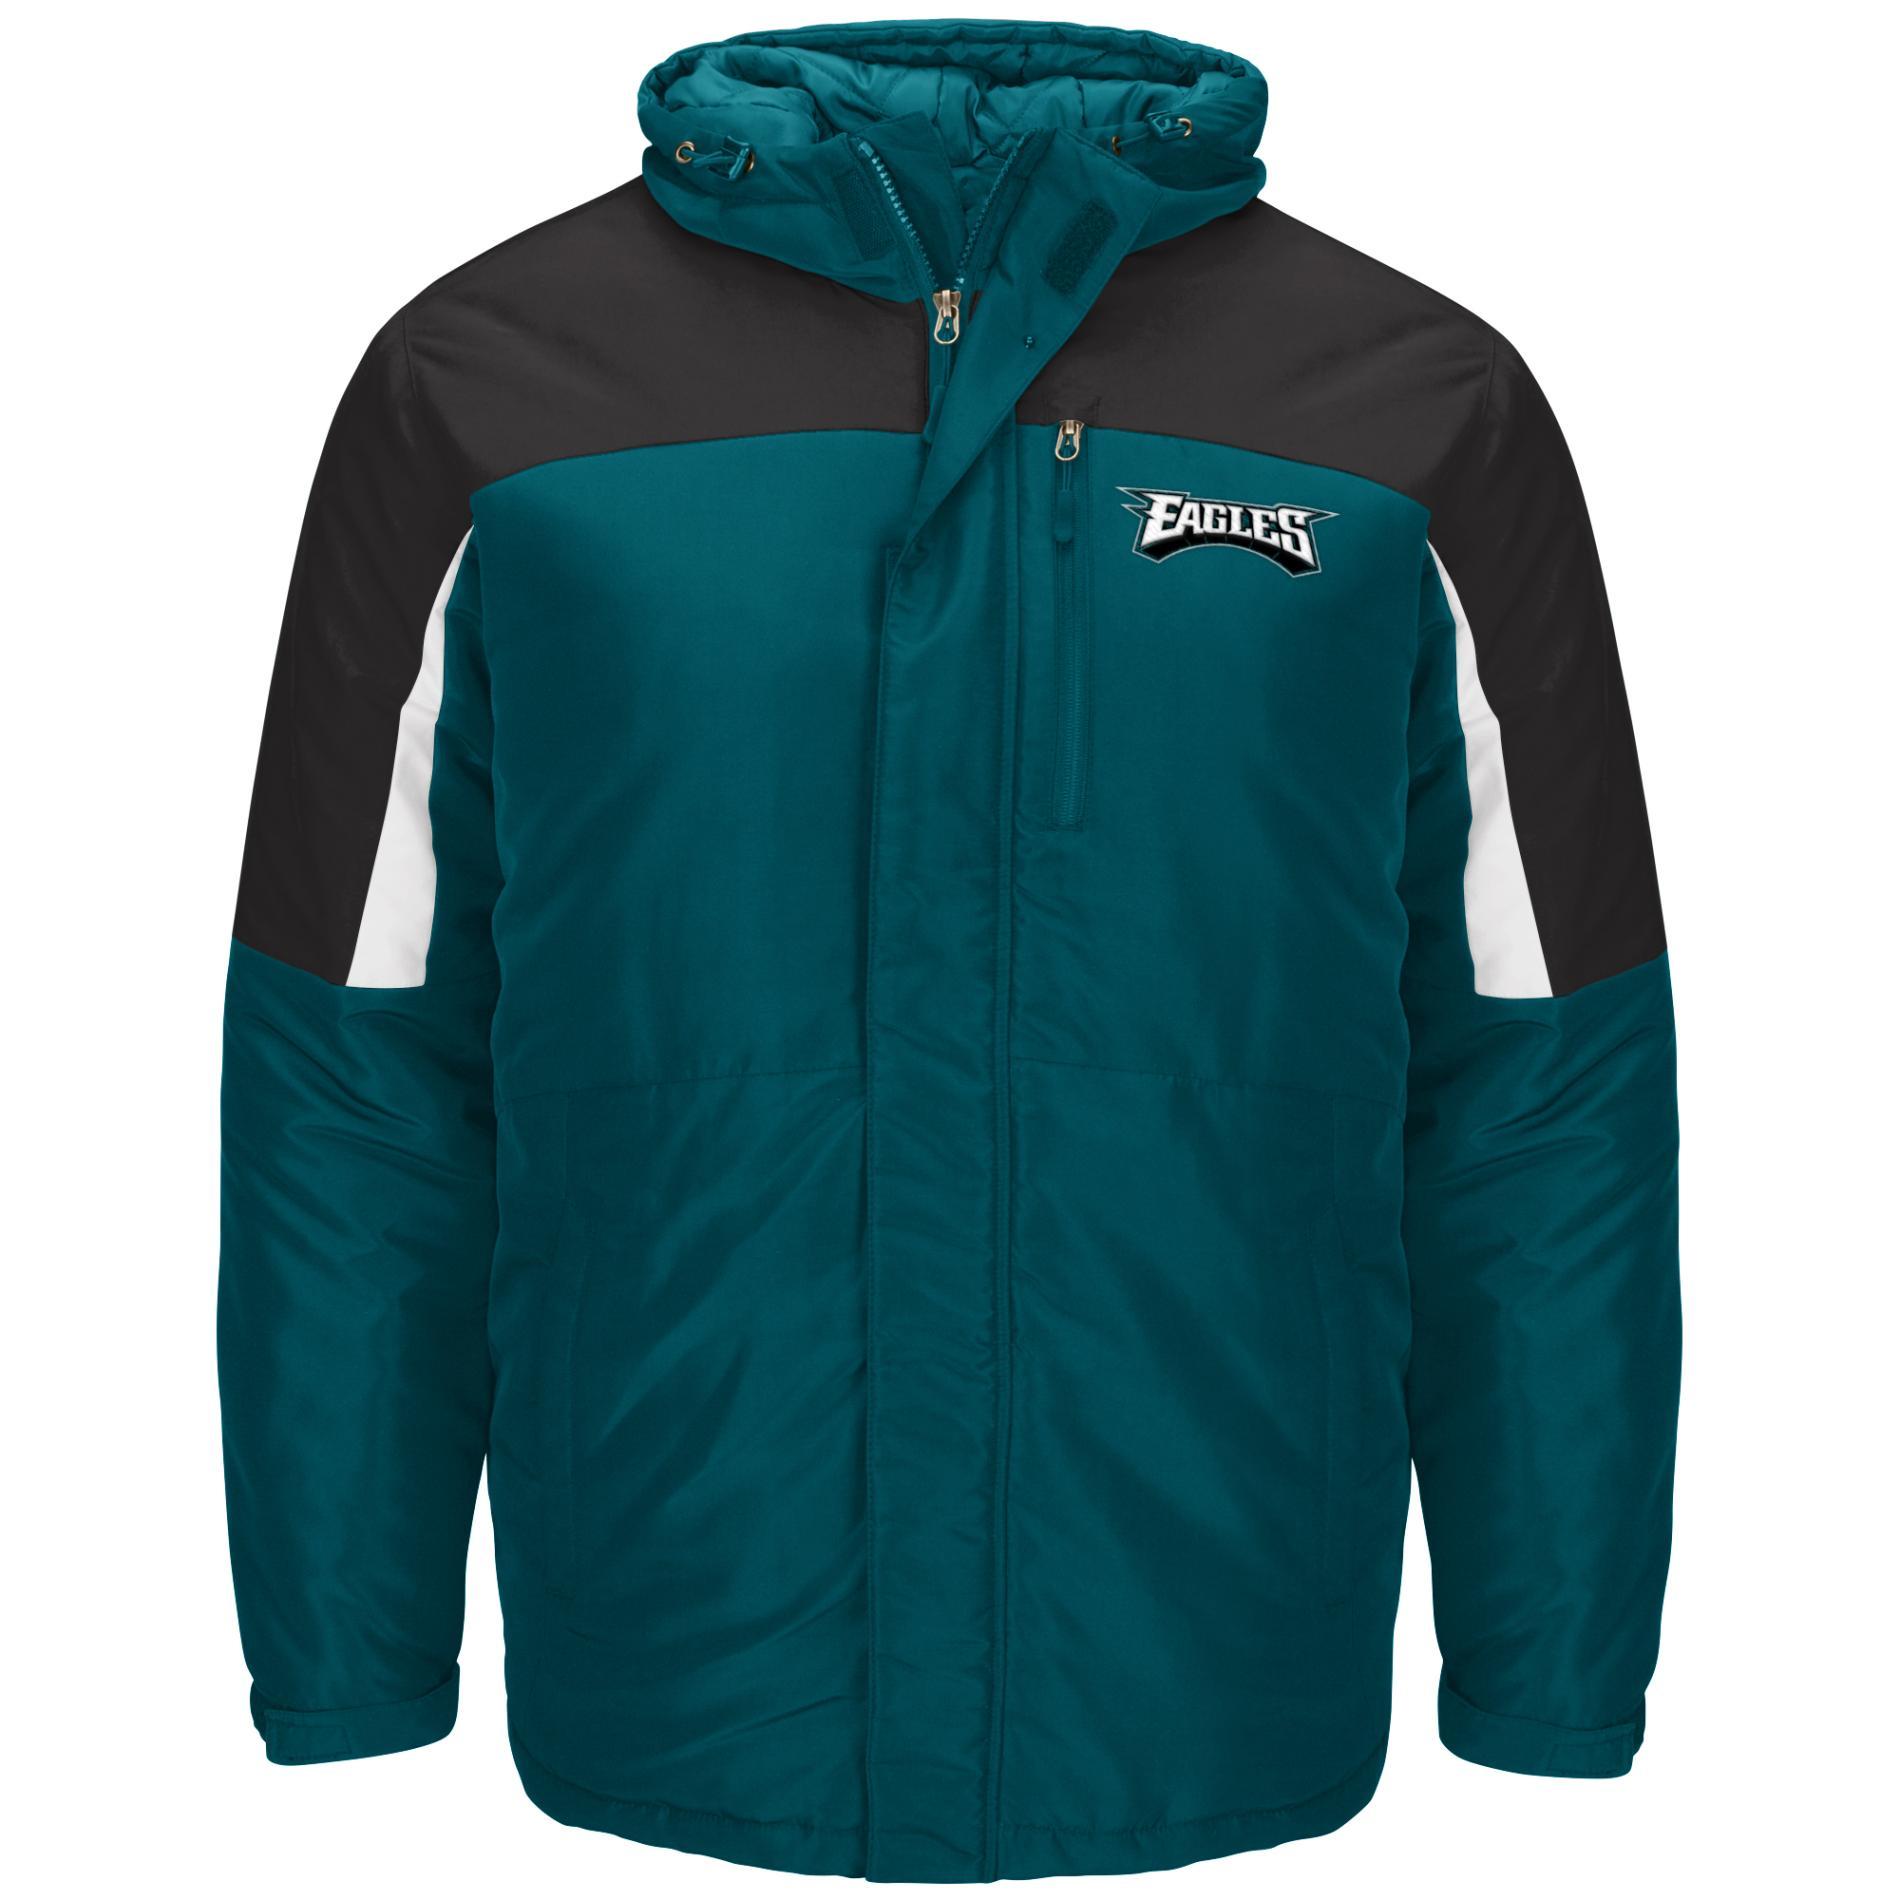 Pay Shell Credit Card >> NFL Men's Big & Tall Winter Jacket - Philadelphia Eagles